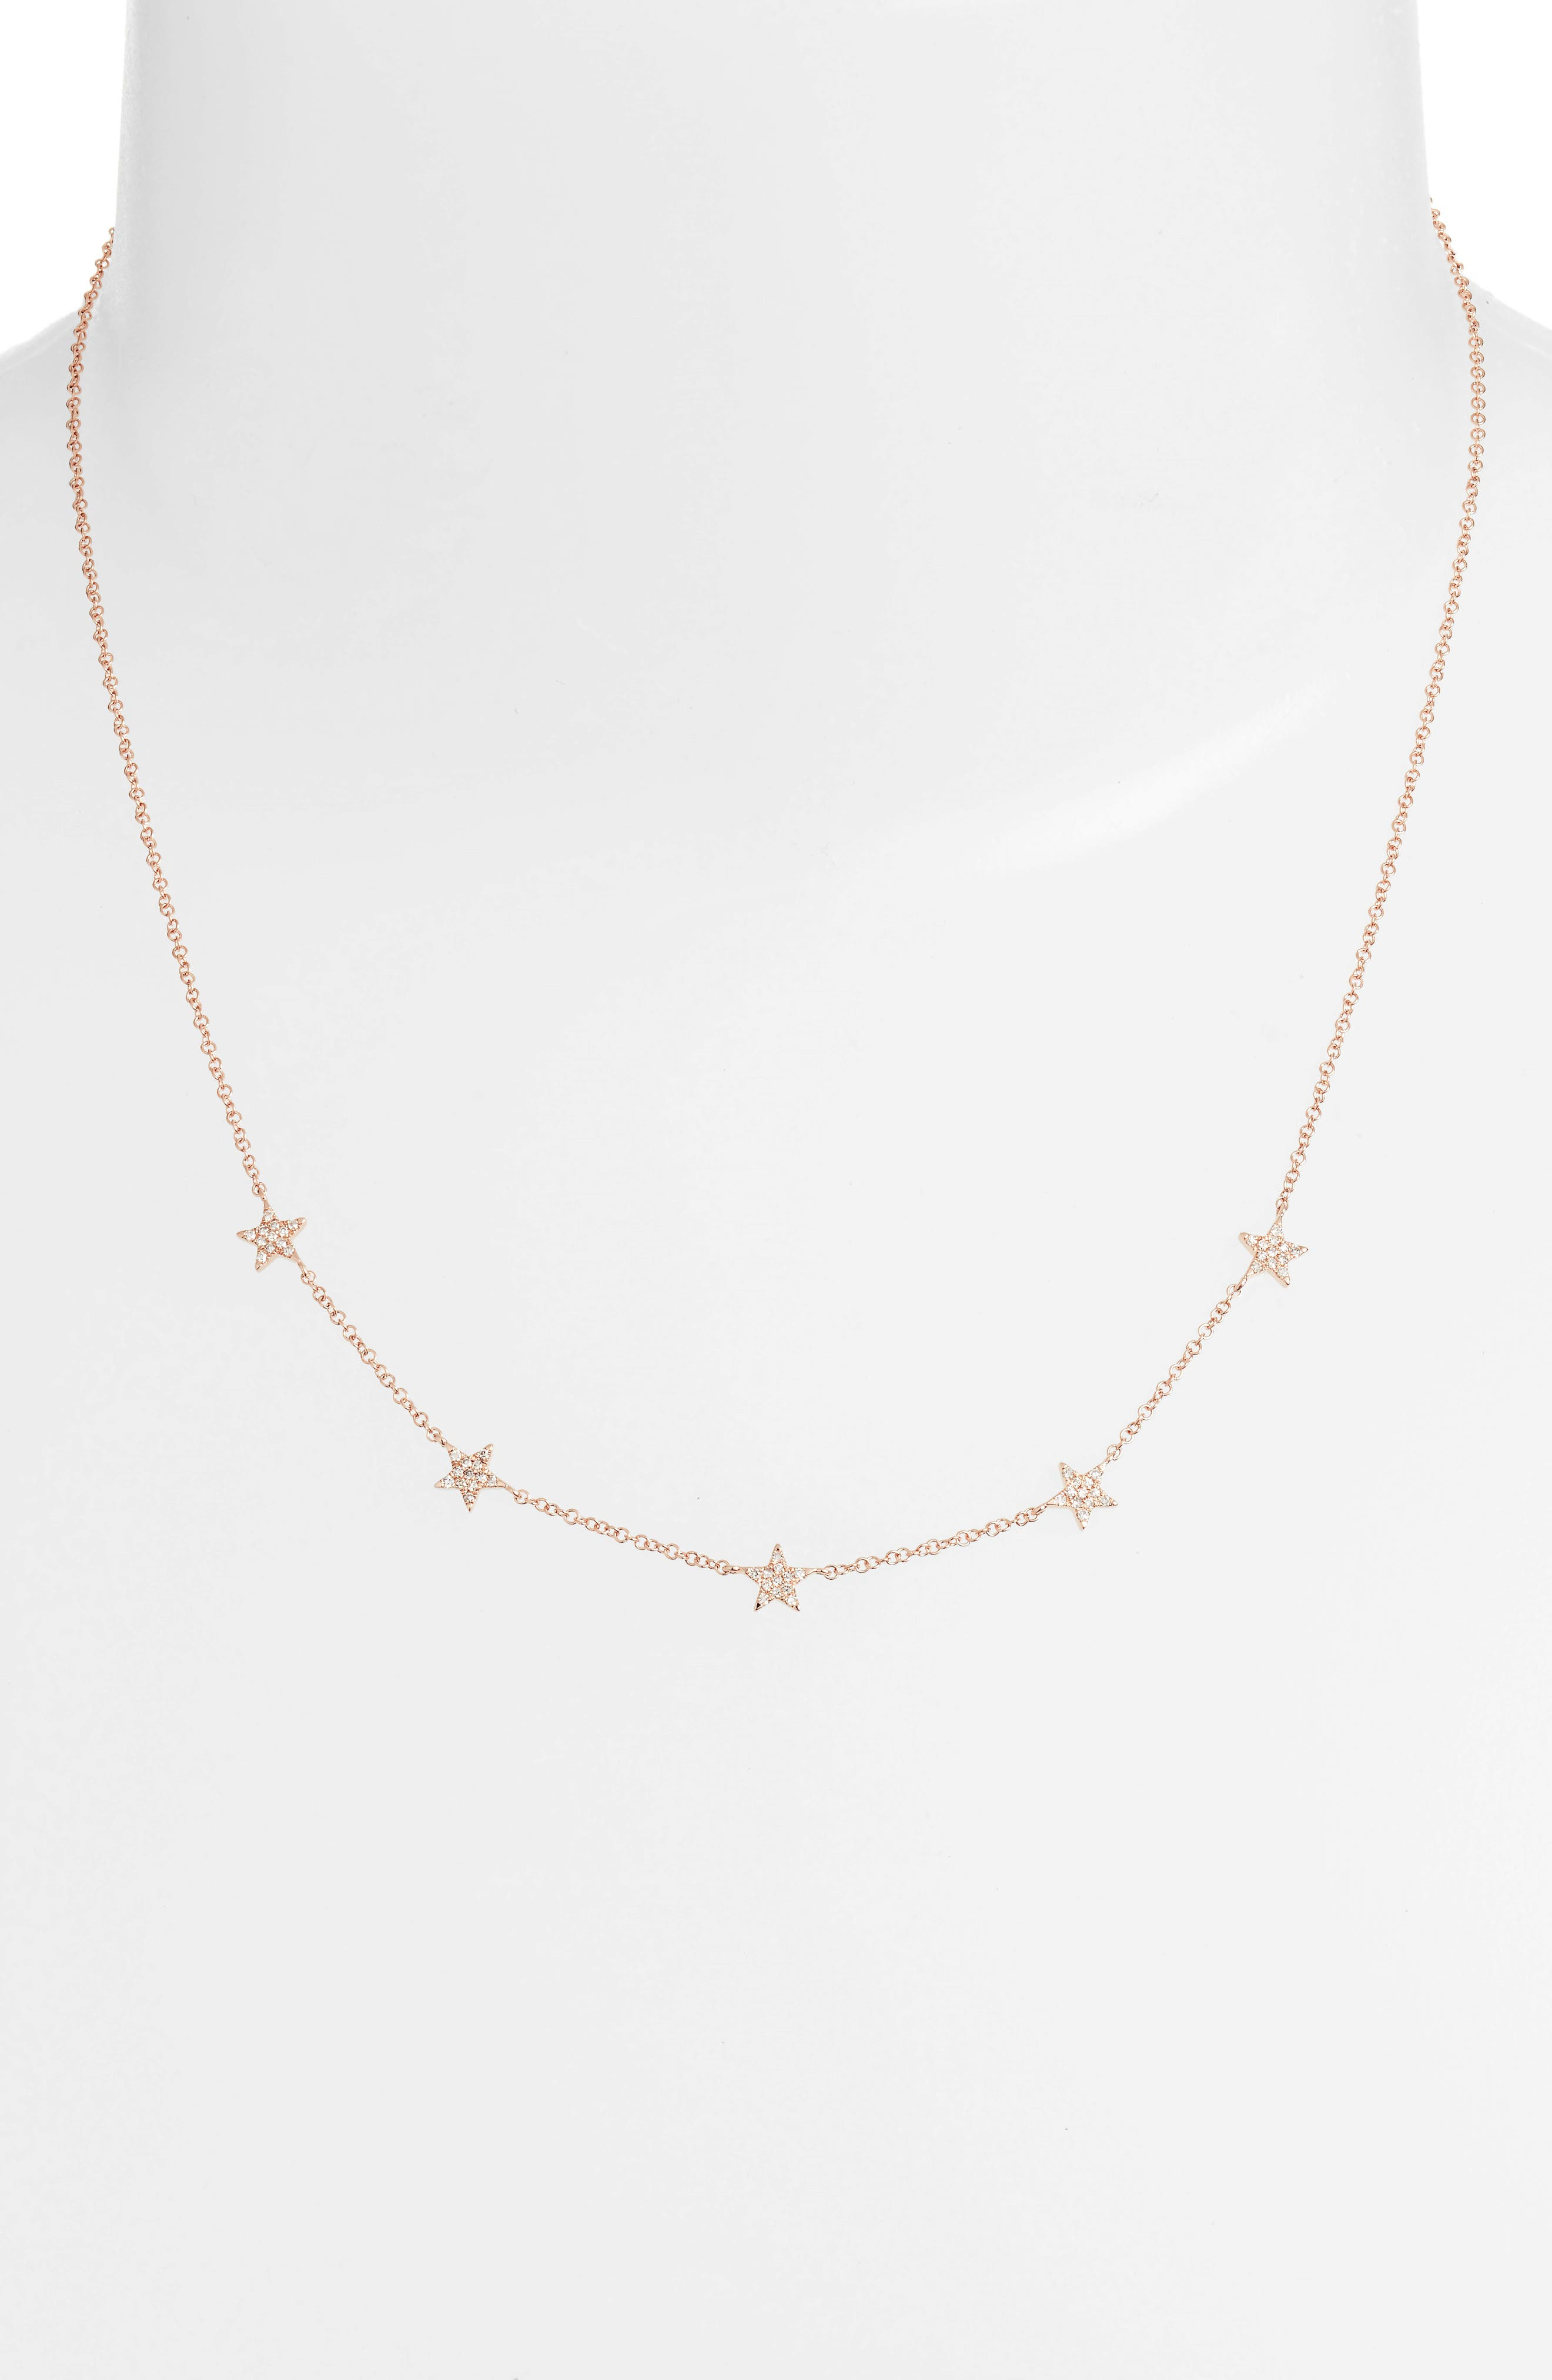 Five-Star Diamond Station Necklace,                             Alternate thumbnail 2, color,                             ROSE GOLD